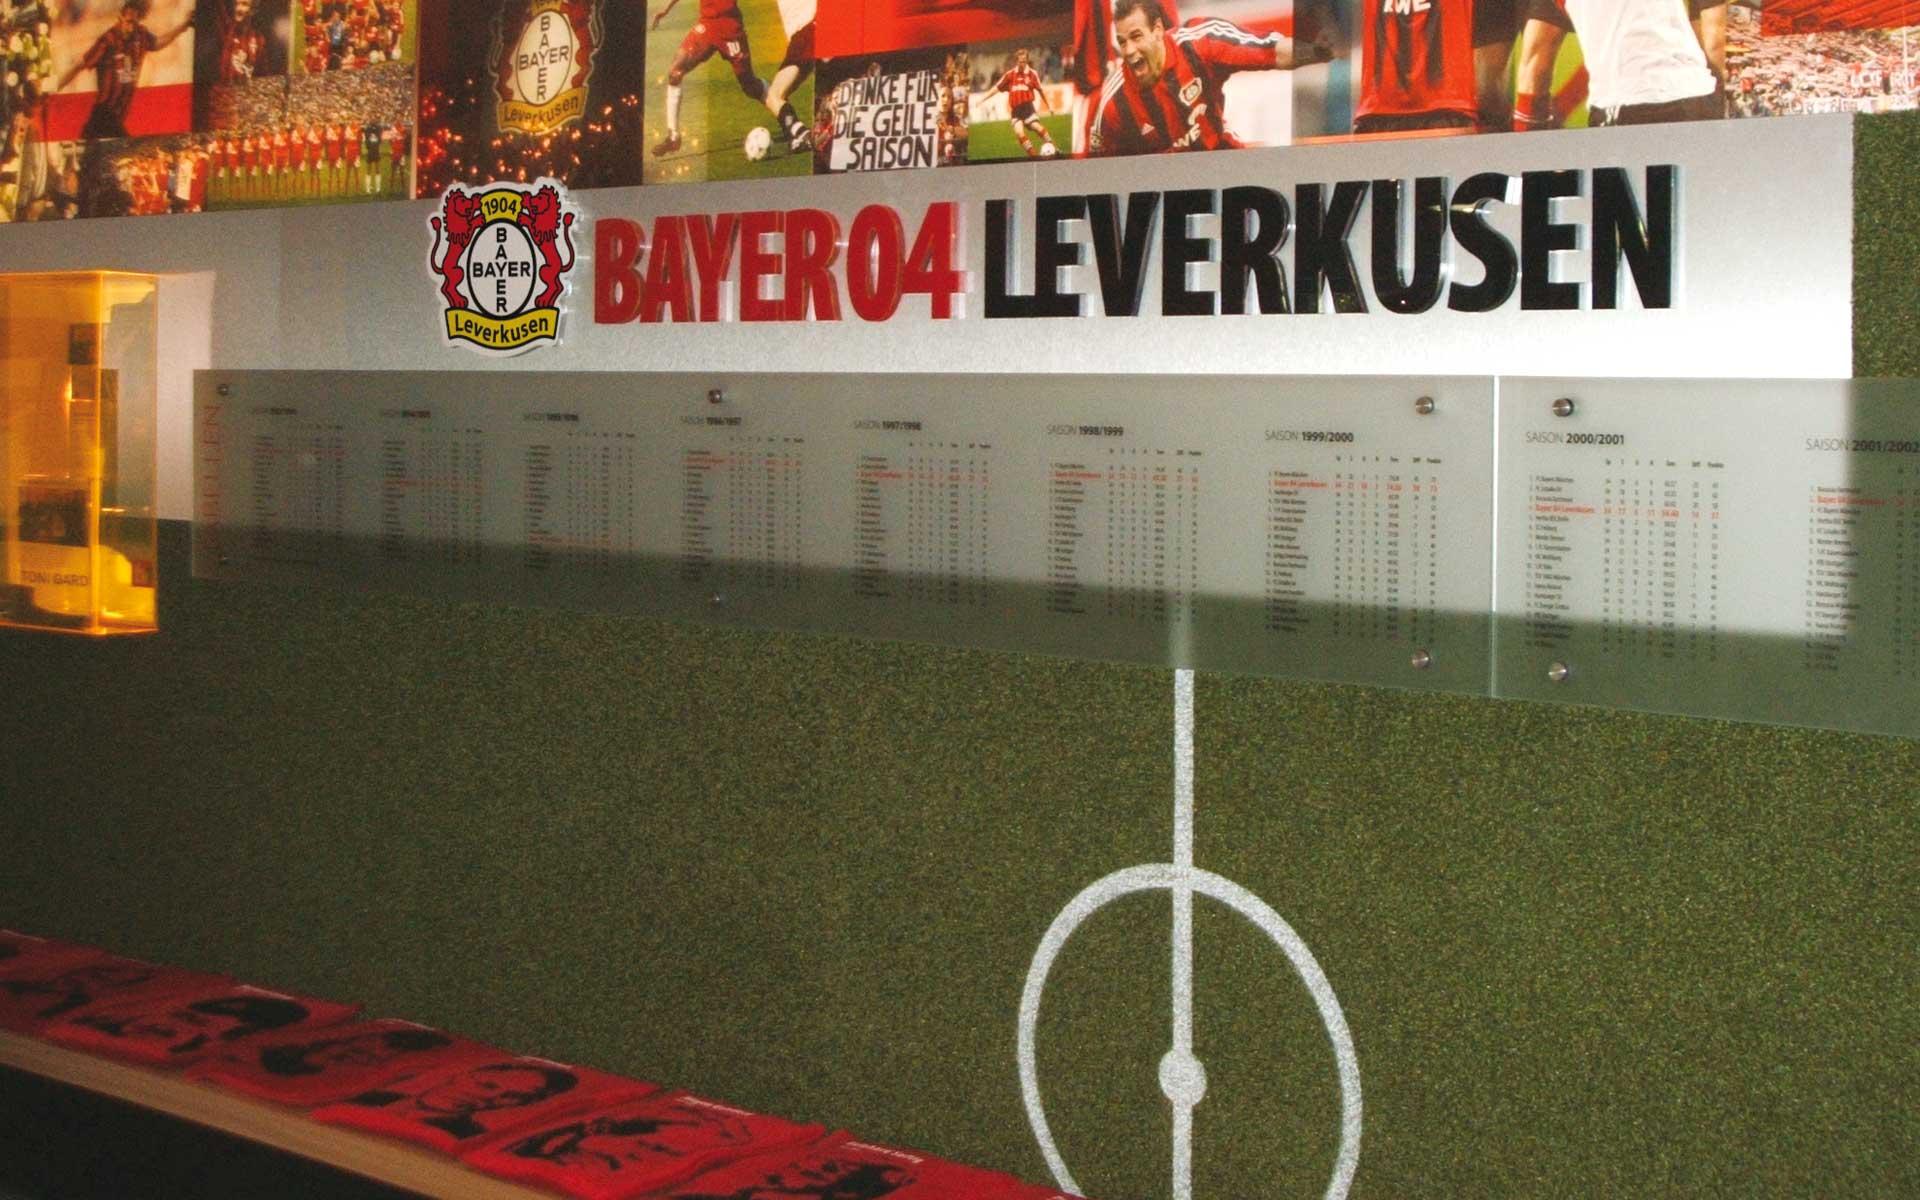 Bayer 04 Foyer BayArena, Brand Space, Tabellen